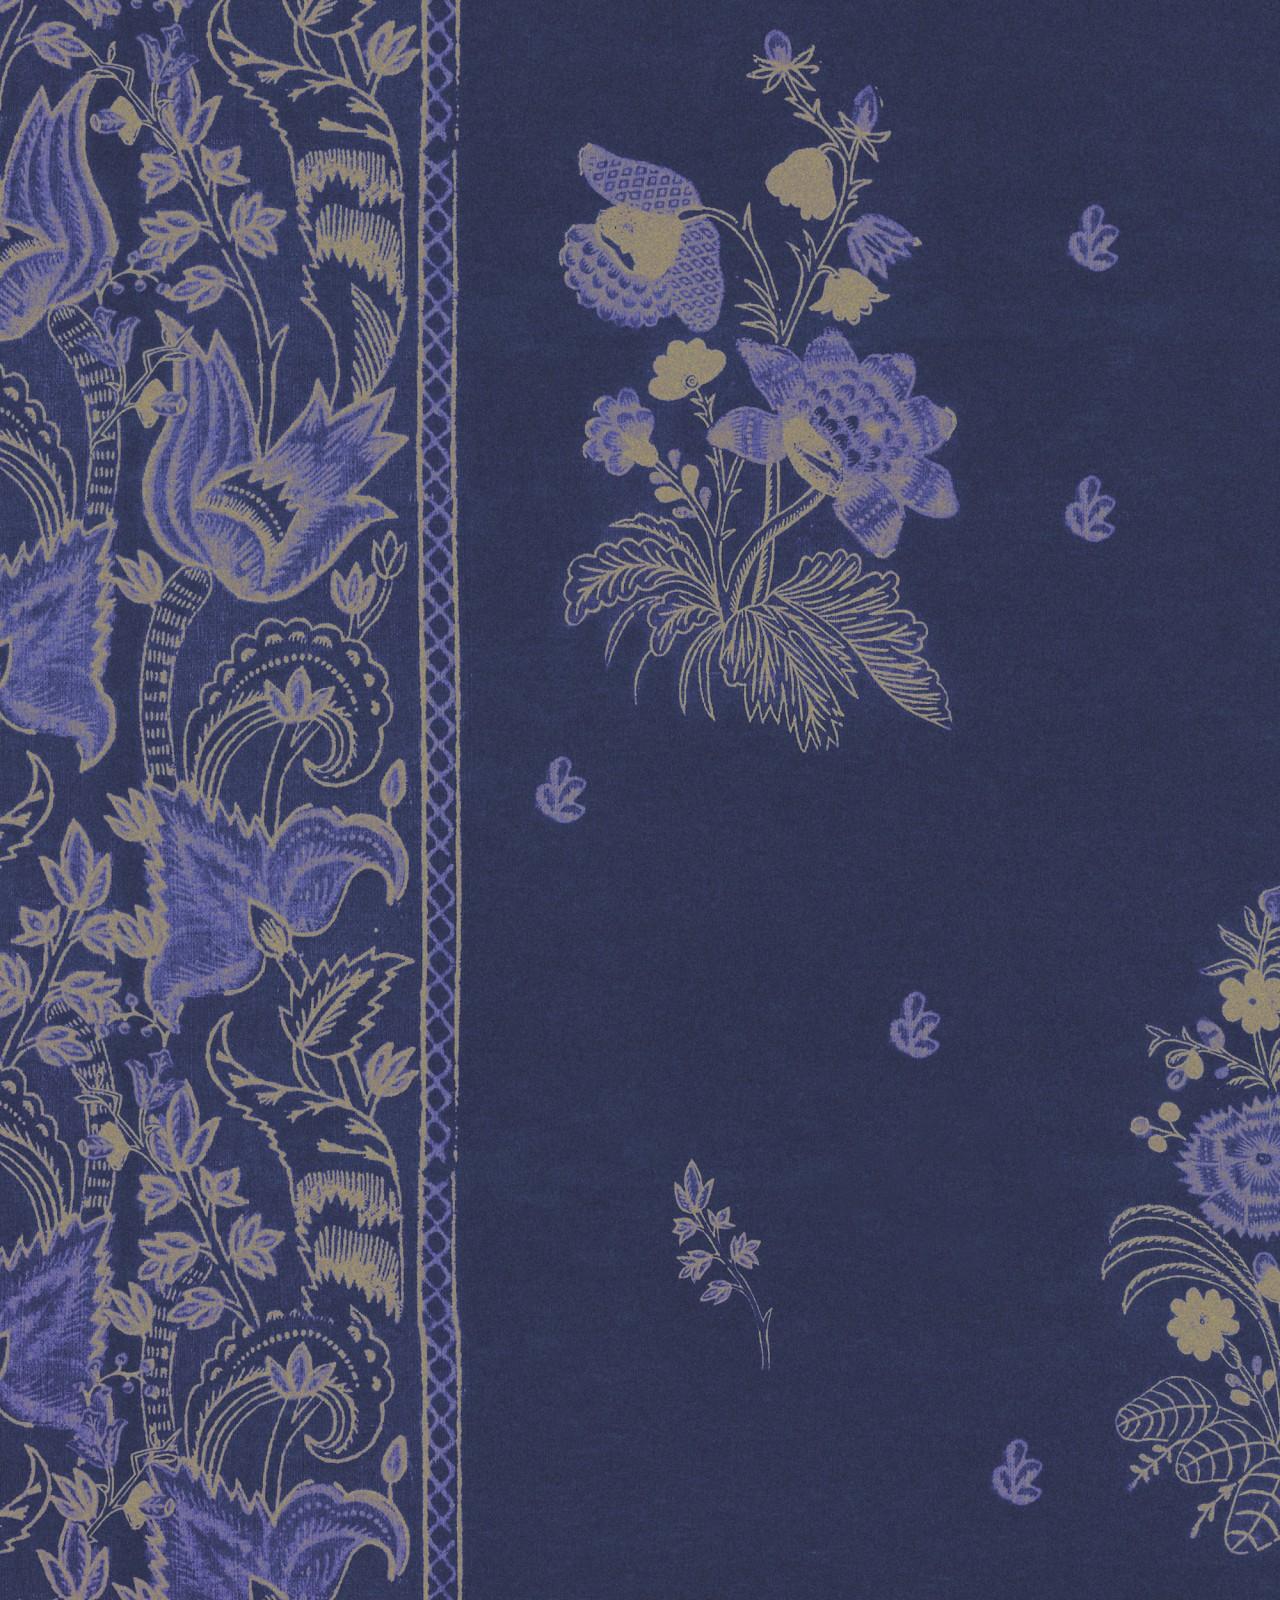 KOROND FLORAL Clematis Wallpaper